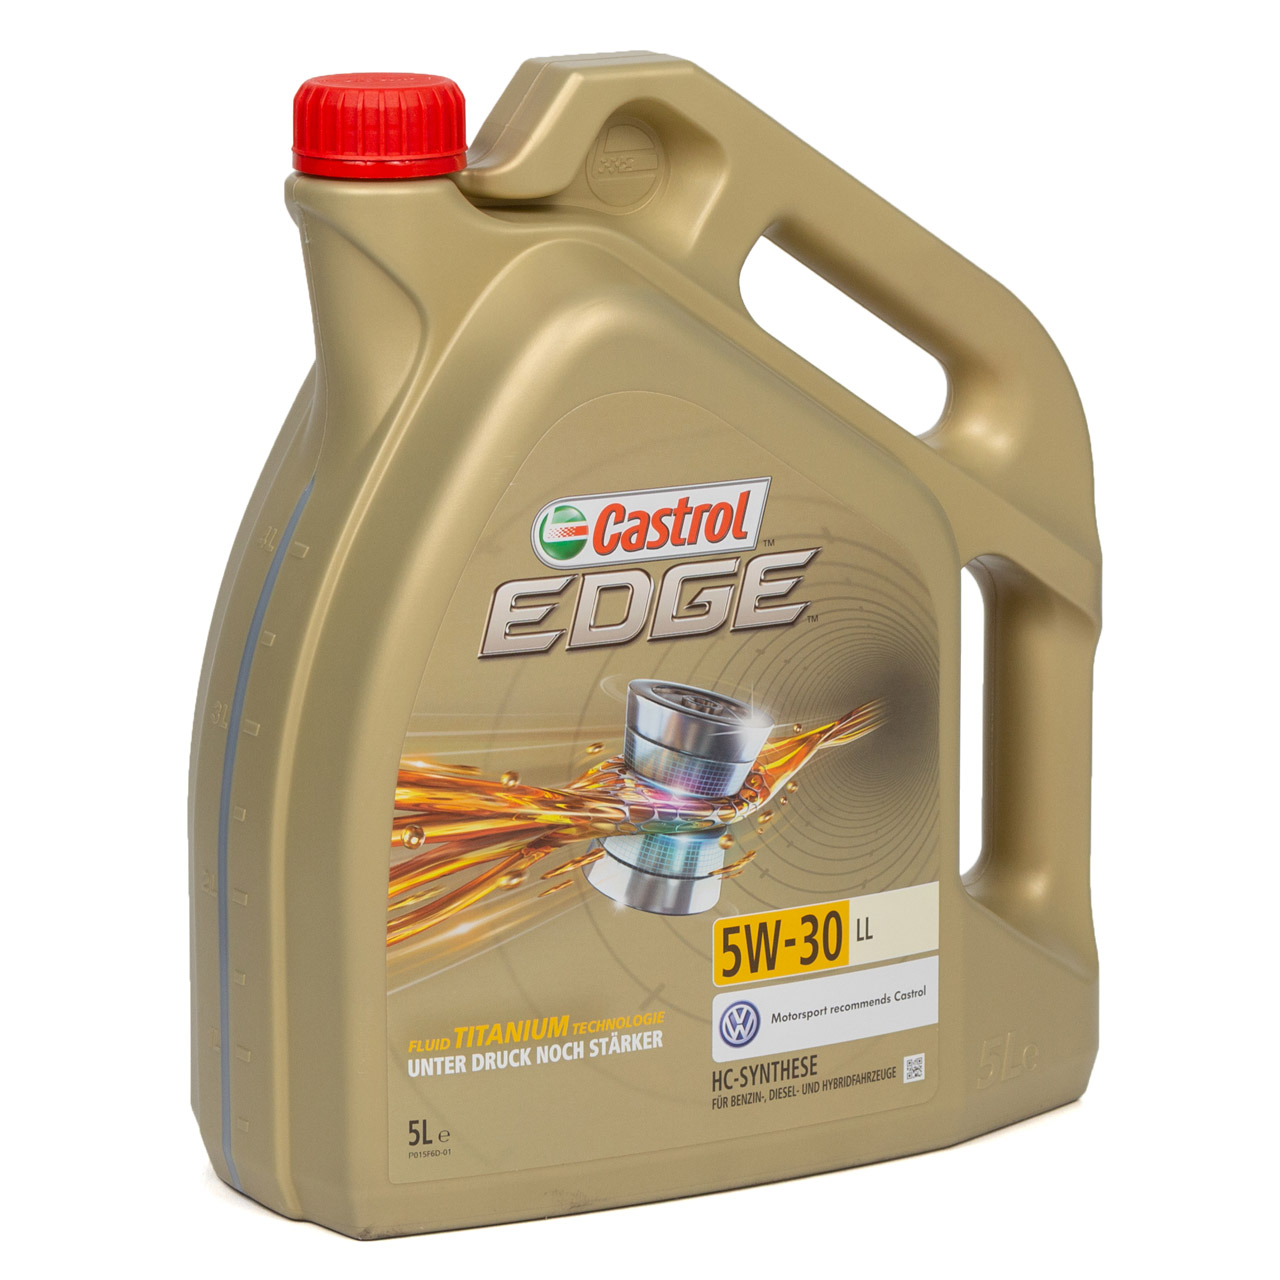 CASTROL EDGE Motoröl ÖL TITANIUM 5W30 LL ACEA C3 VW 504.00/507.00 - 5L 5 Liter